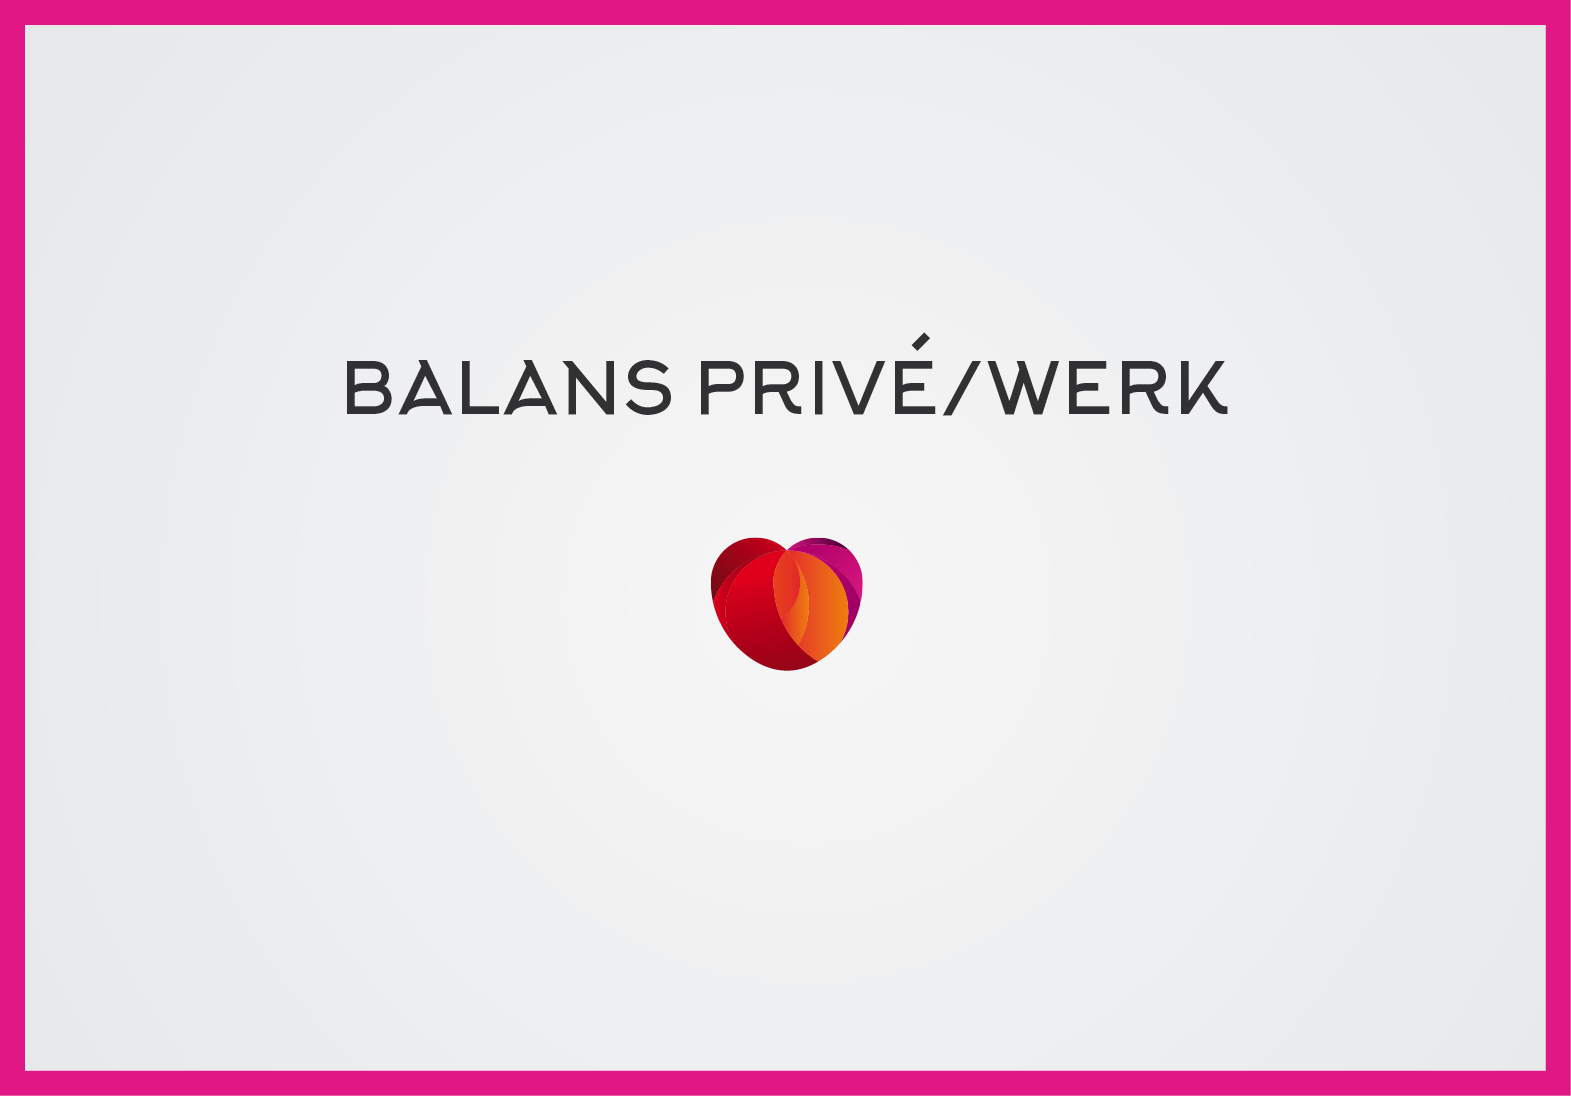 Balans privé/werk